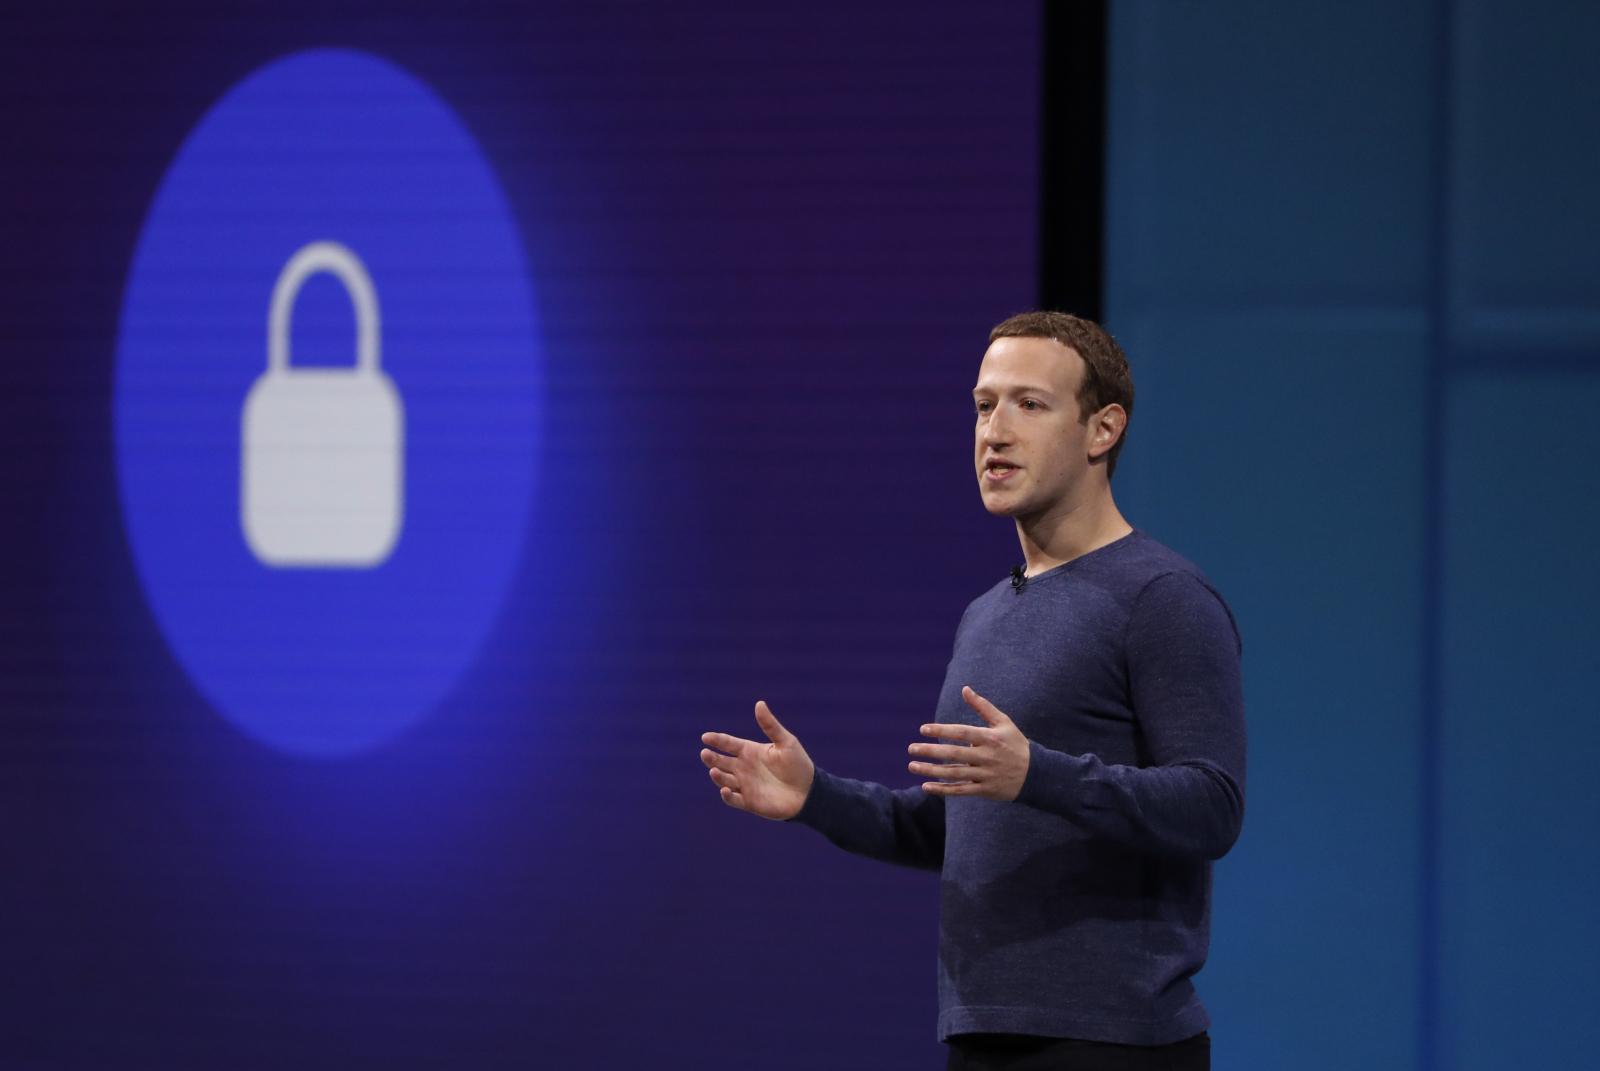 Mark Zuckerberg at F8 Conference